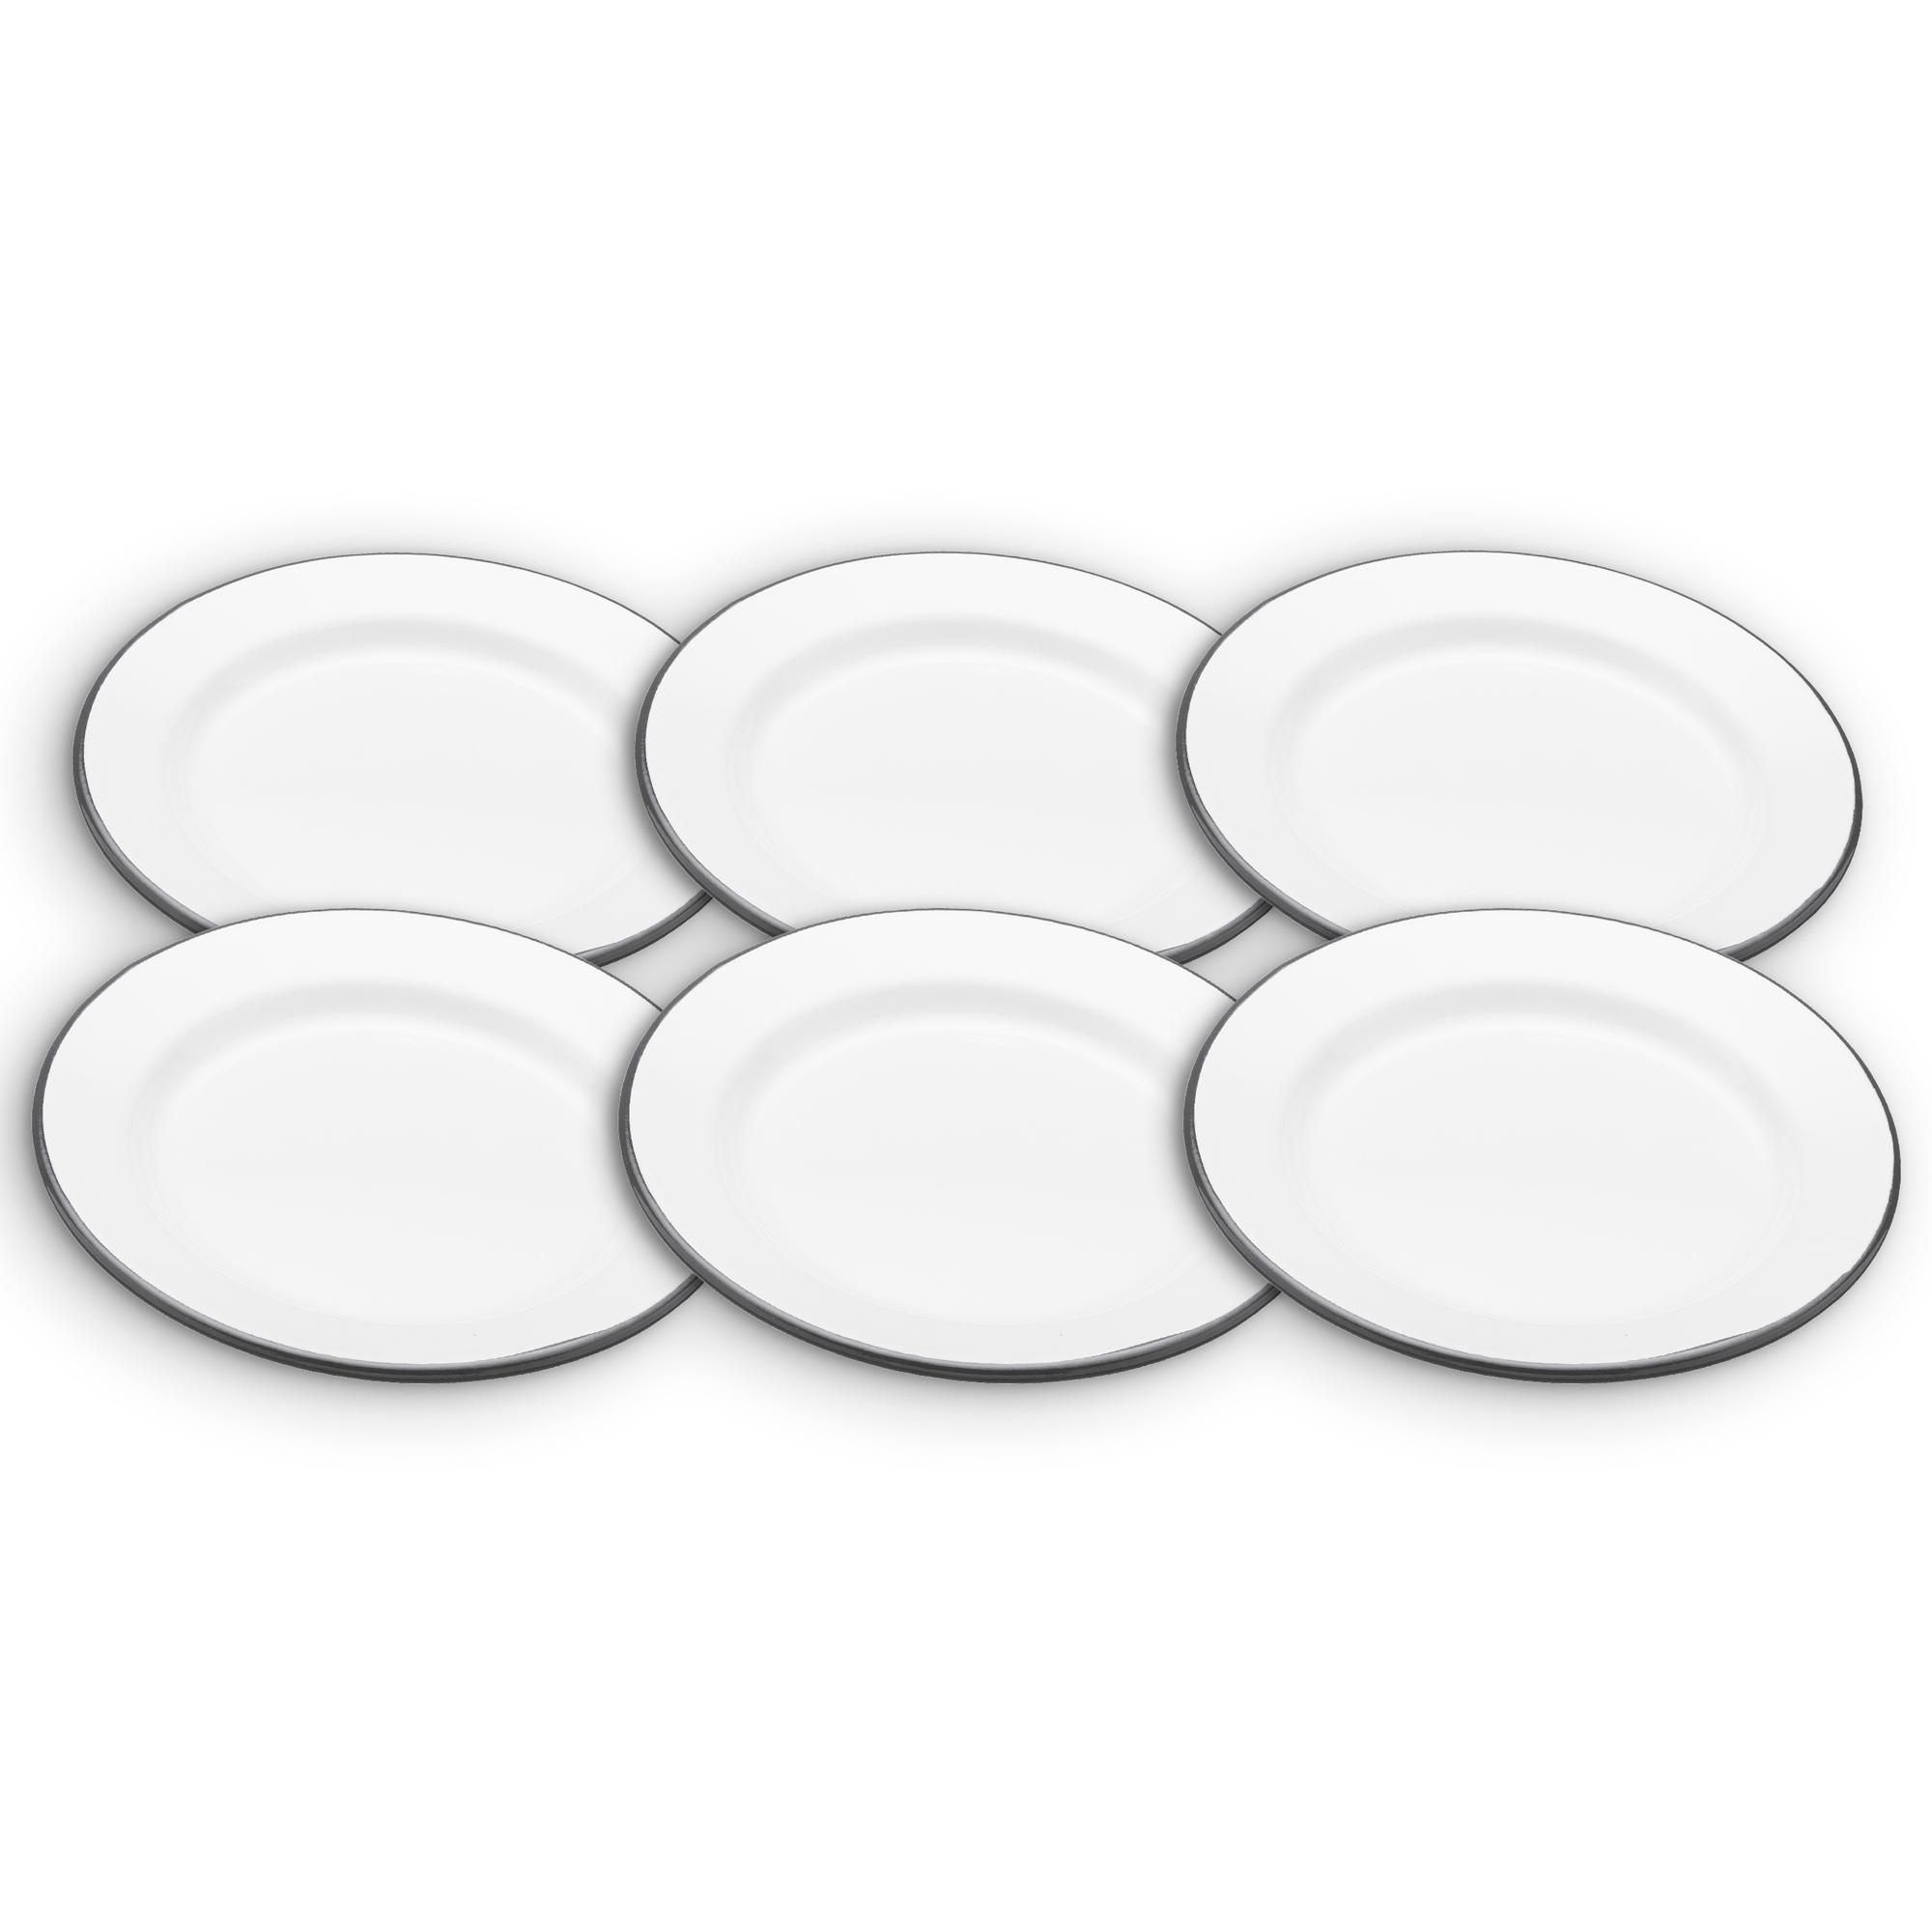 KitchenCraft Living Nostalgia Enamel Breakfast Plates (Set of 6)  sc 1 st  Amazon UK & KitchenCraft Living Nostalgia Enamel Breakfast Plate 24 cm (9.5 ...